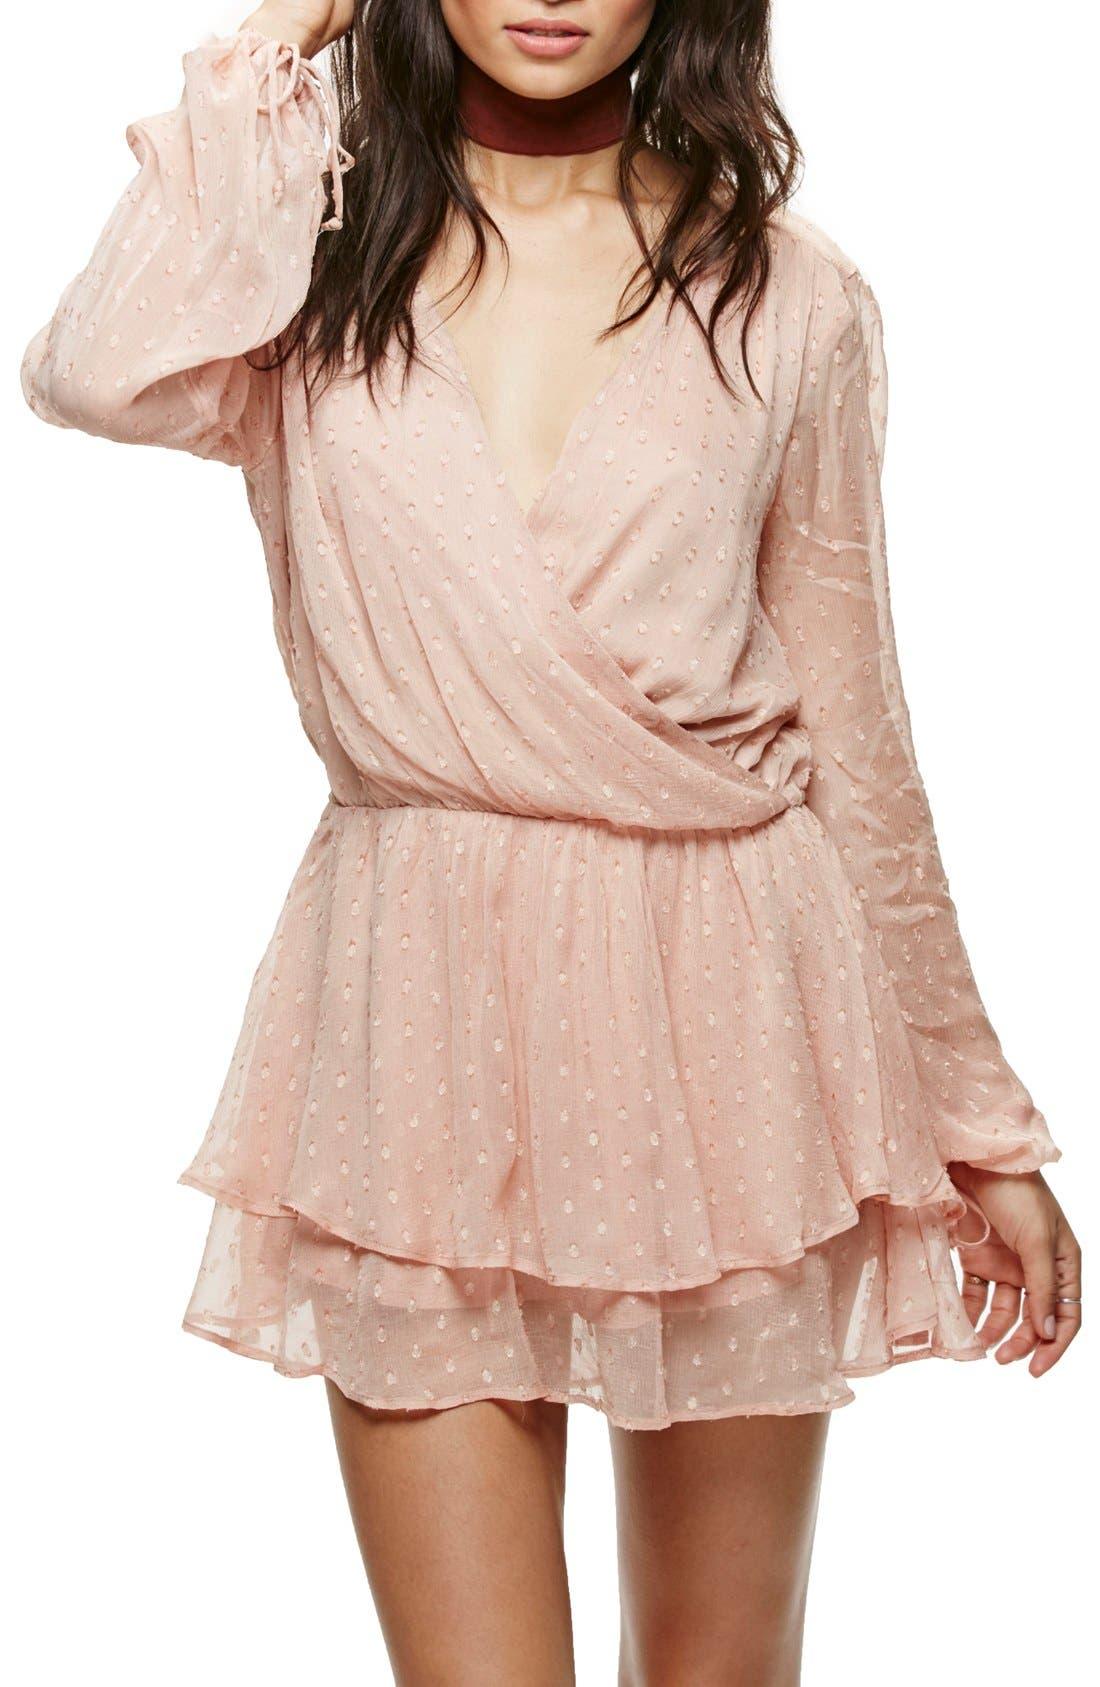 Alternate Image 1 Selected - Free People Daliah Minidress